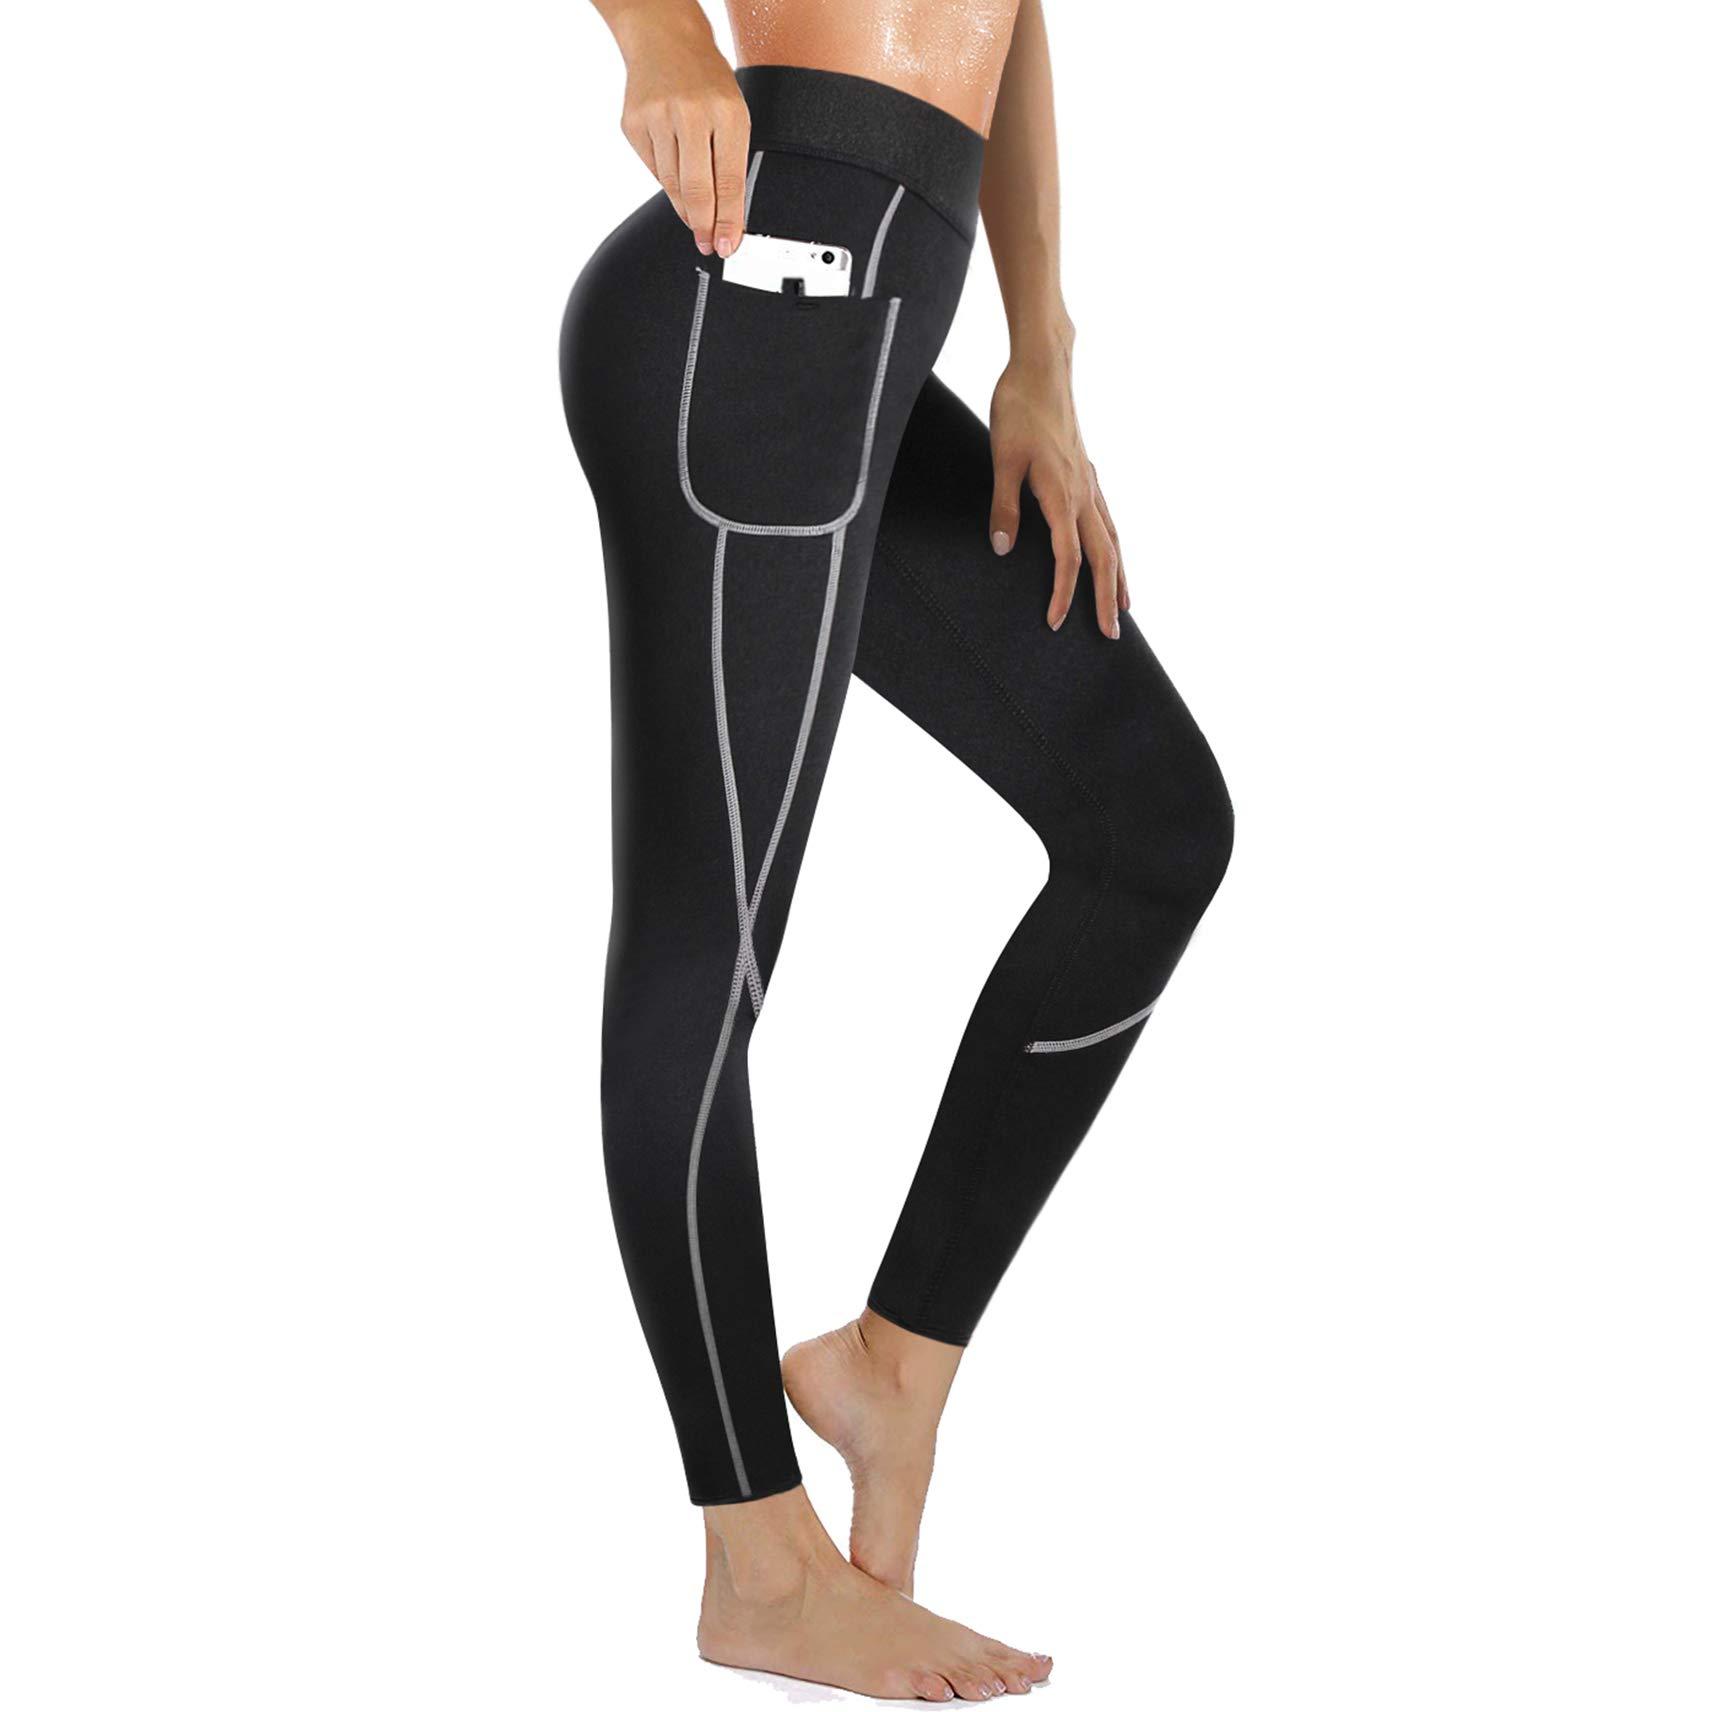 Rolewpy Women Neoprene Sauna Slimming Pants Weight Loss Hot Thermo Sweat Body Shaper Capri for Fat Burner Leggings